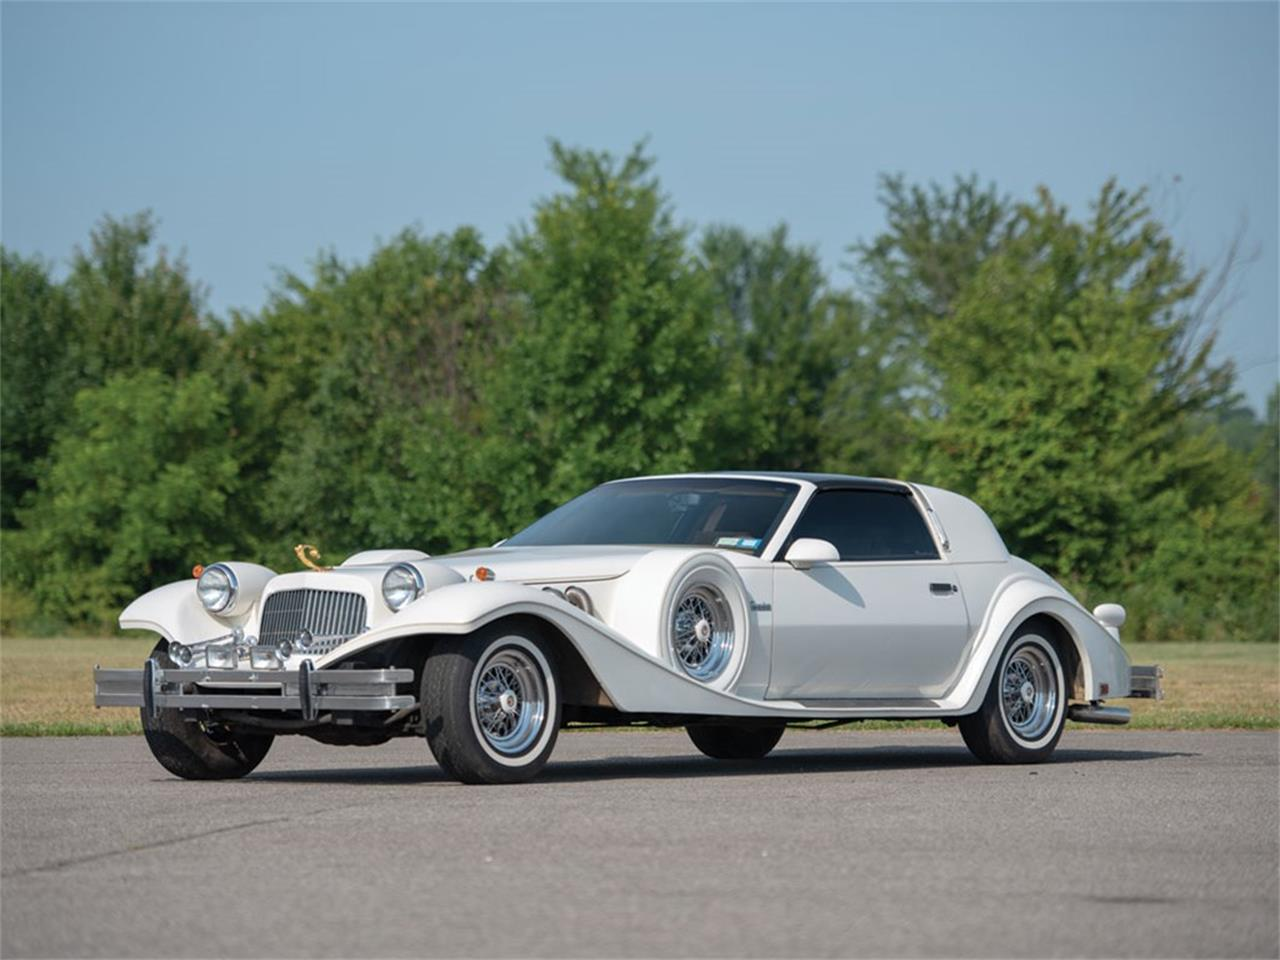 Classic Car Insurance Companies: 1986 Johnson Motor Company Phantom For Sale